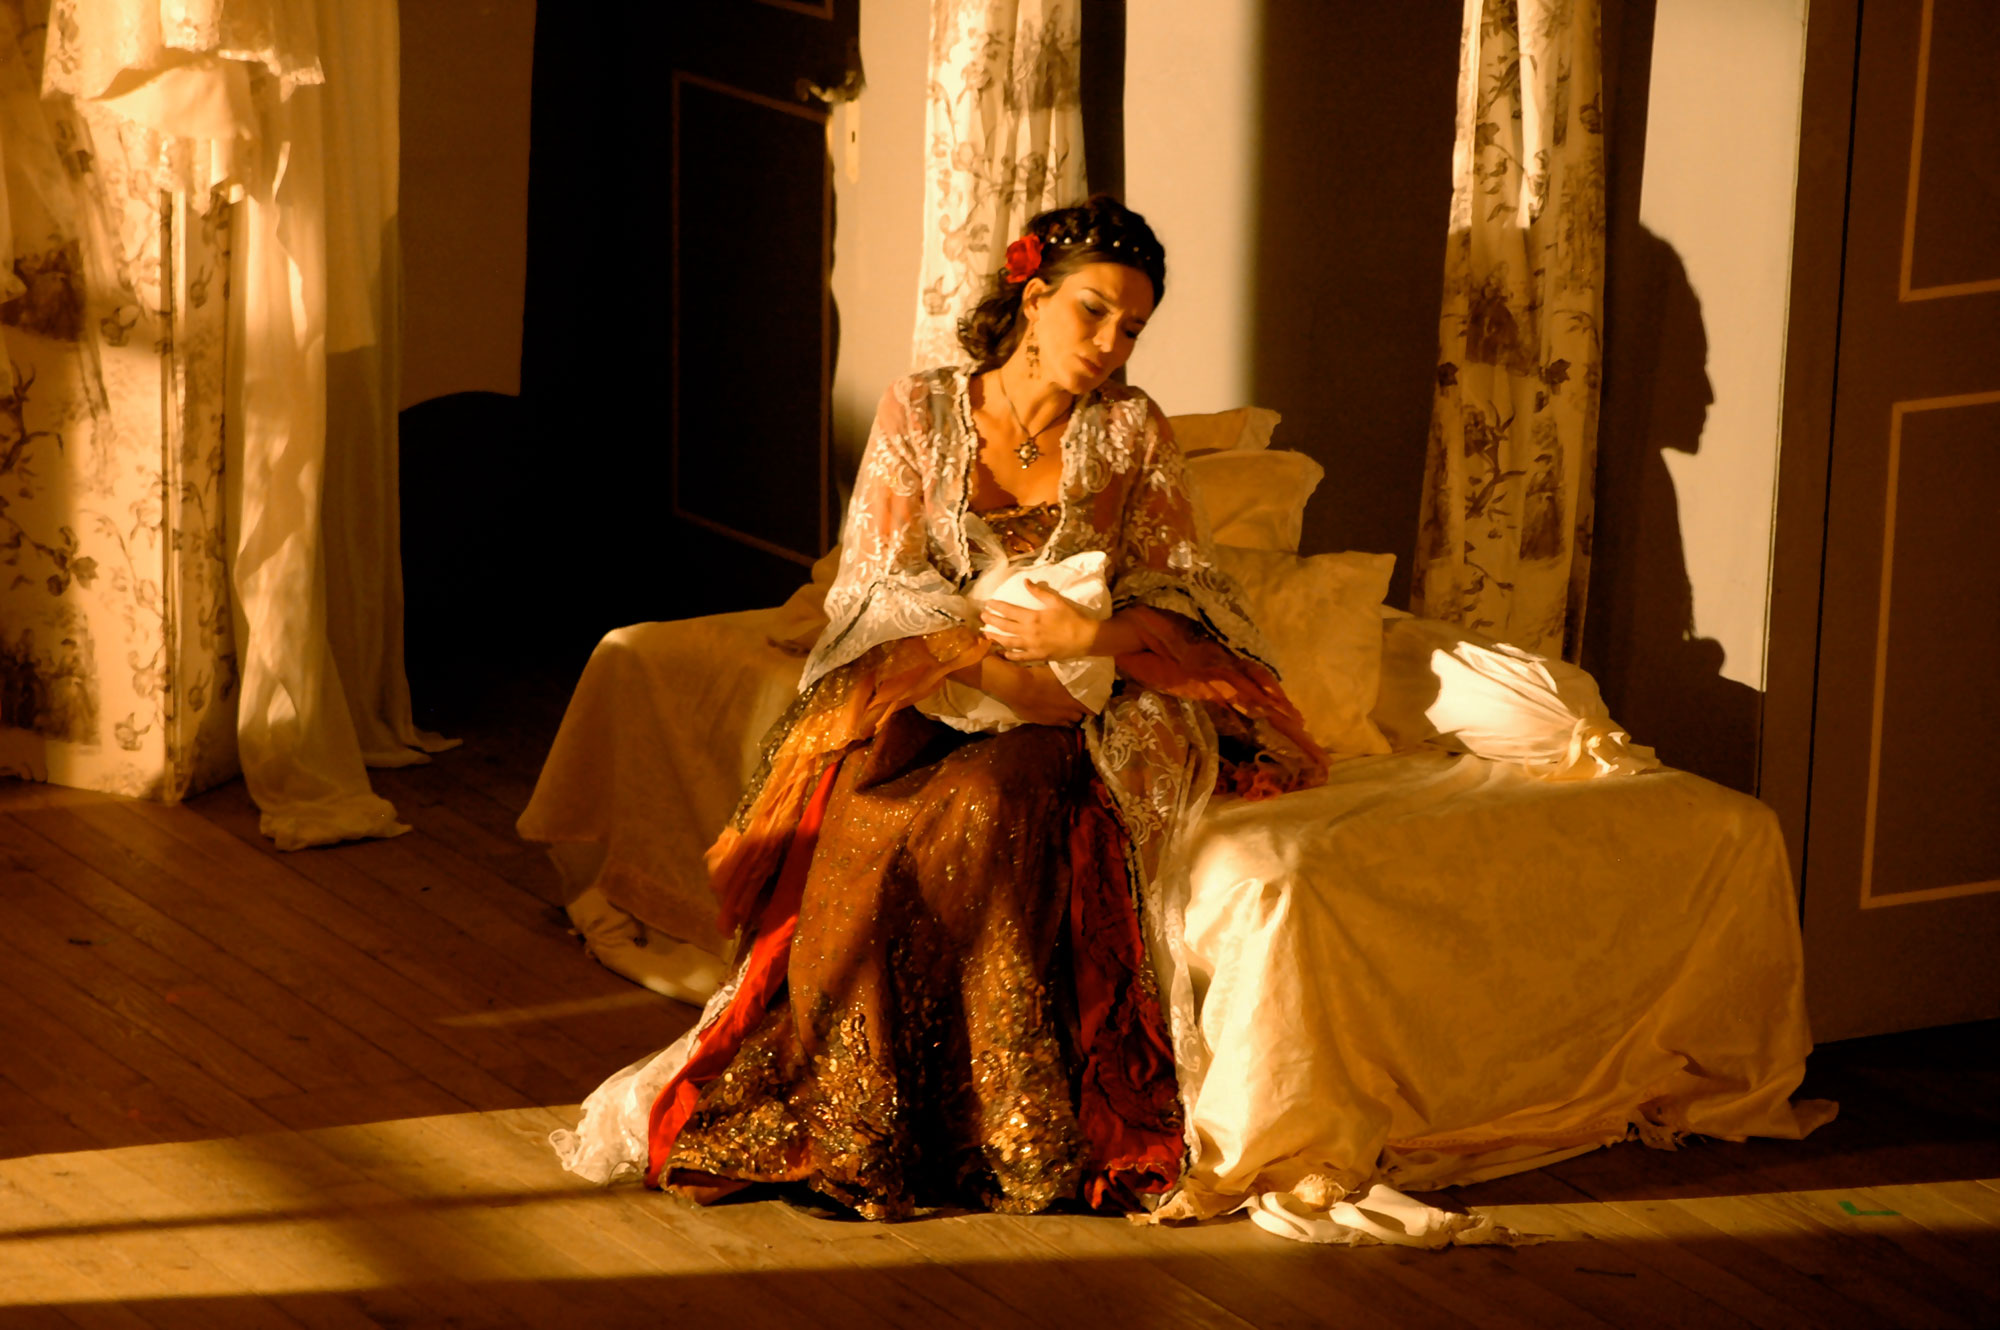 noces-comtesse-fabienne-conrad-03